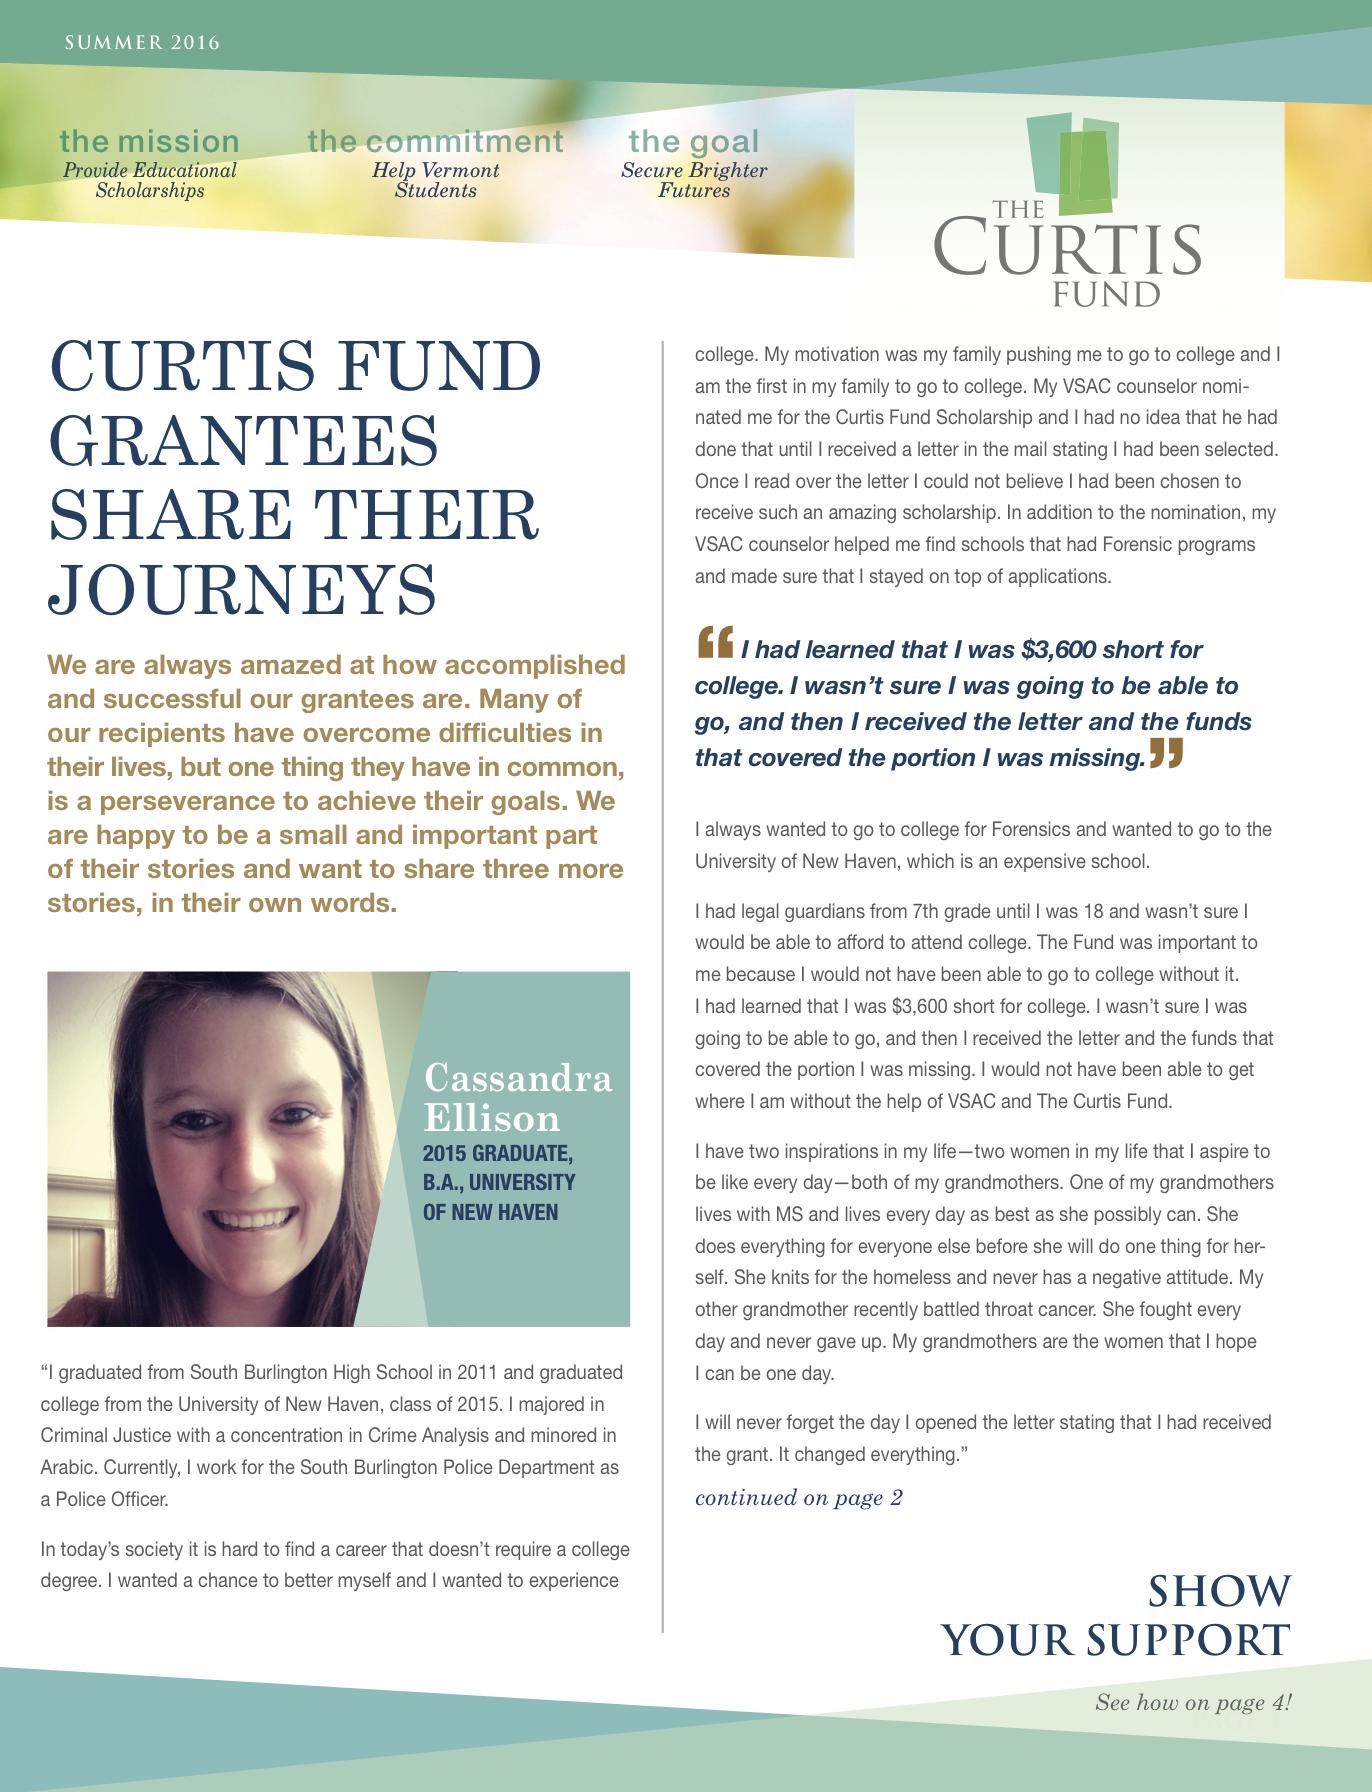 summer 2016 curtis fund newsletter cover